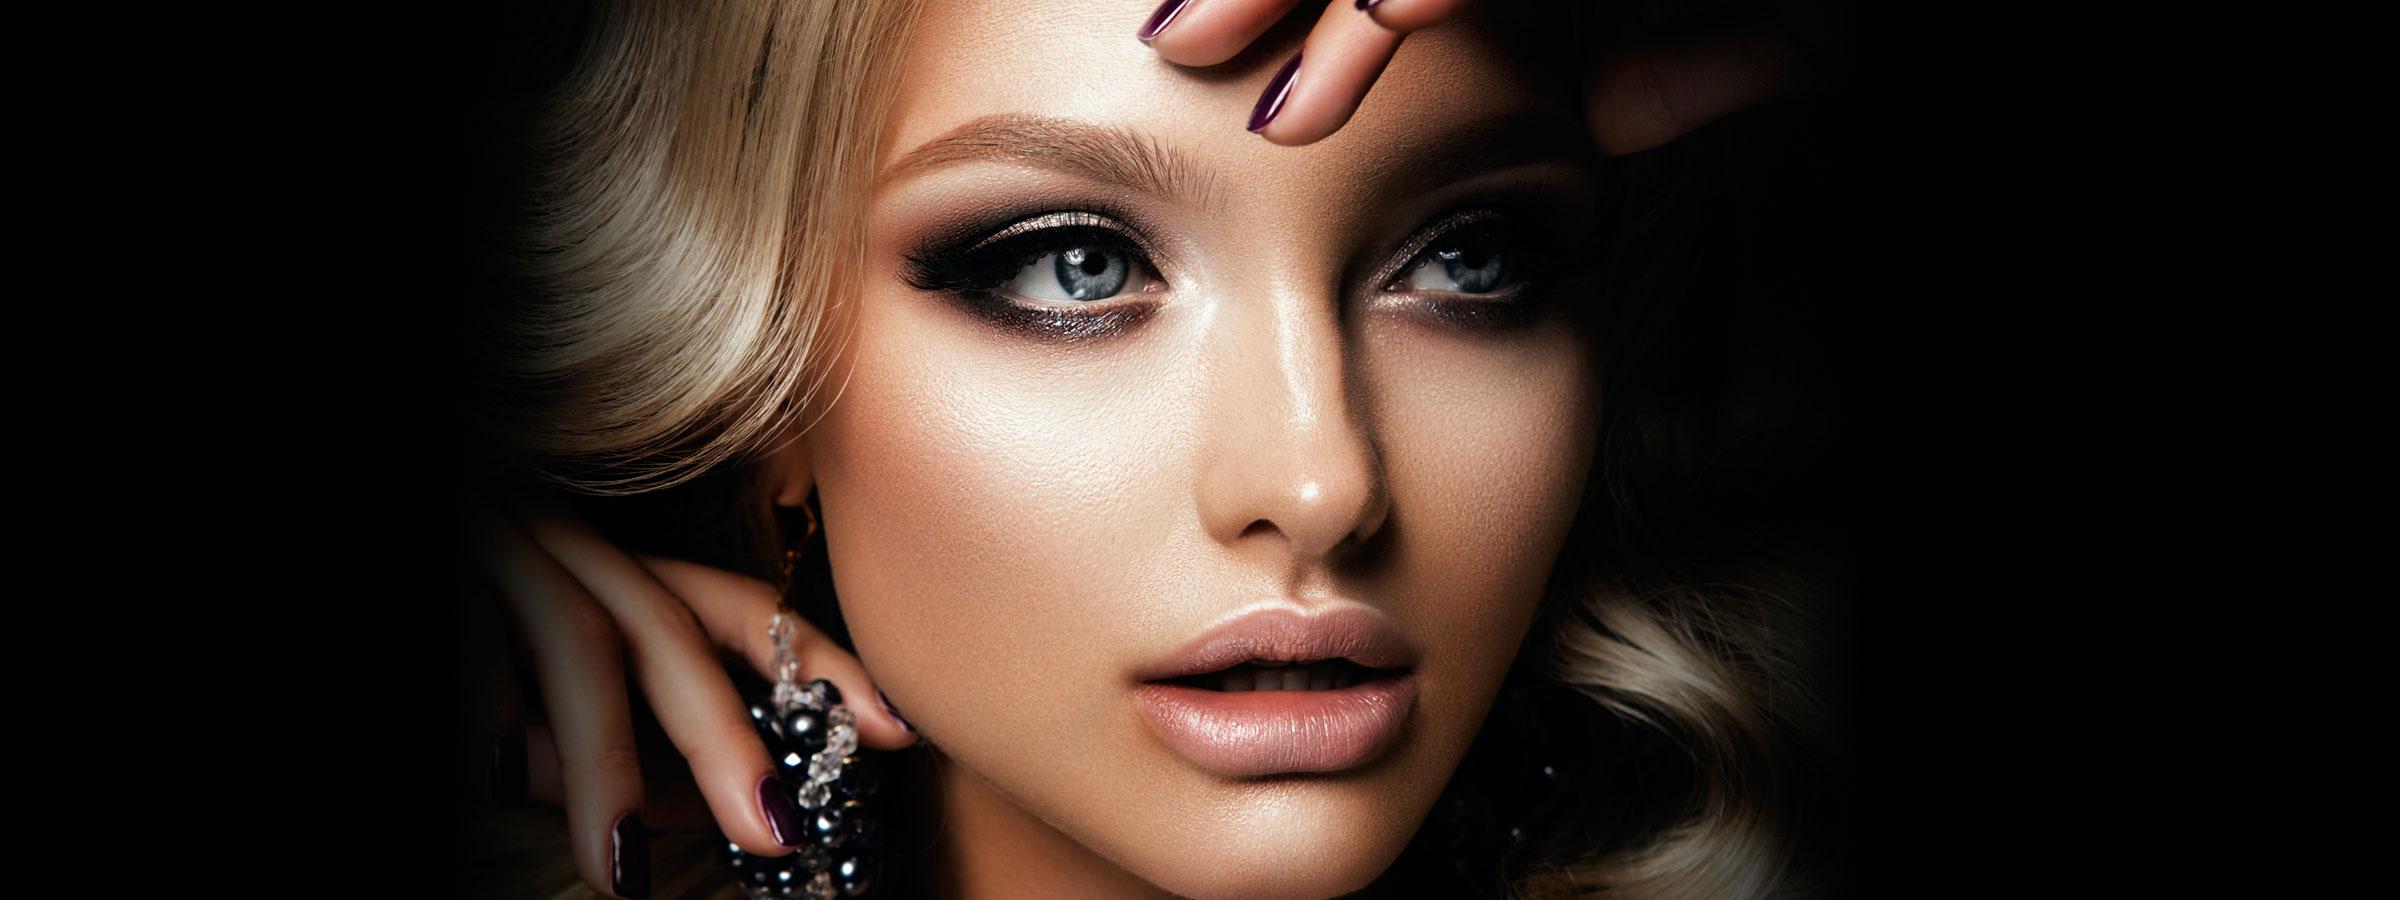 Maquillaje Intensivo30 Horas